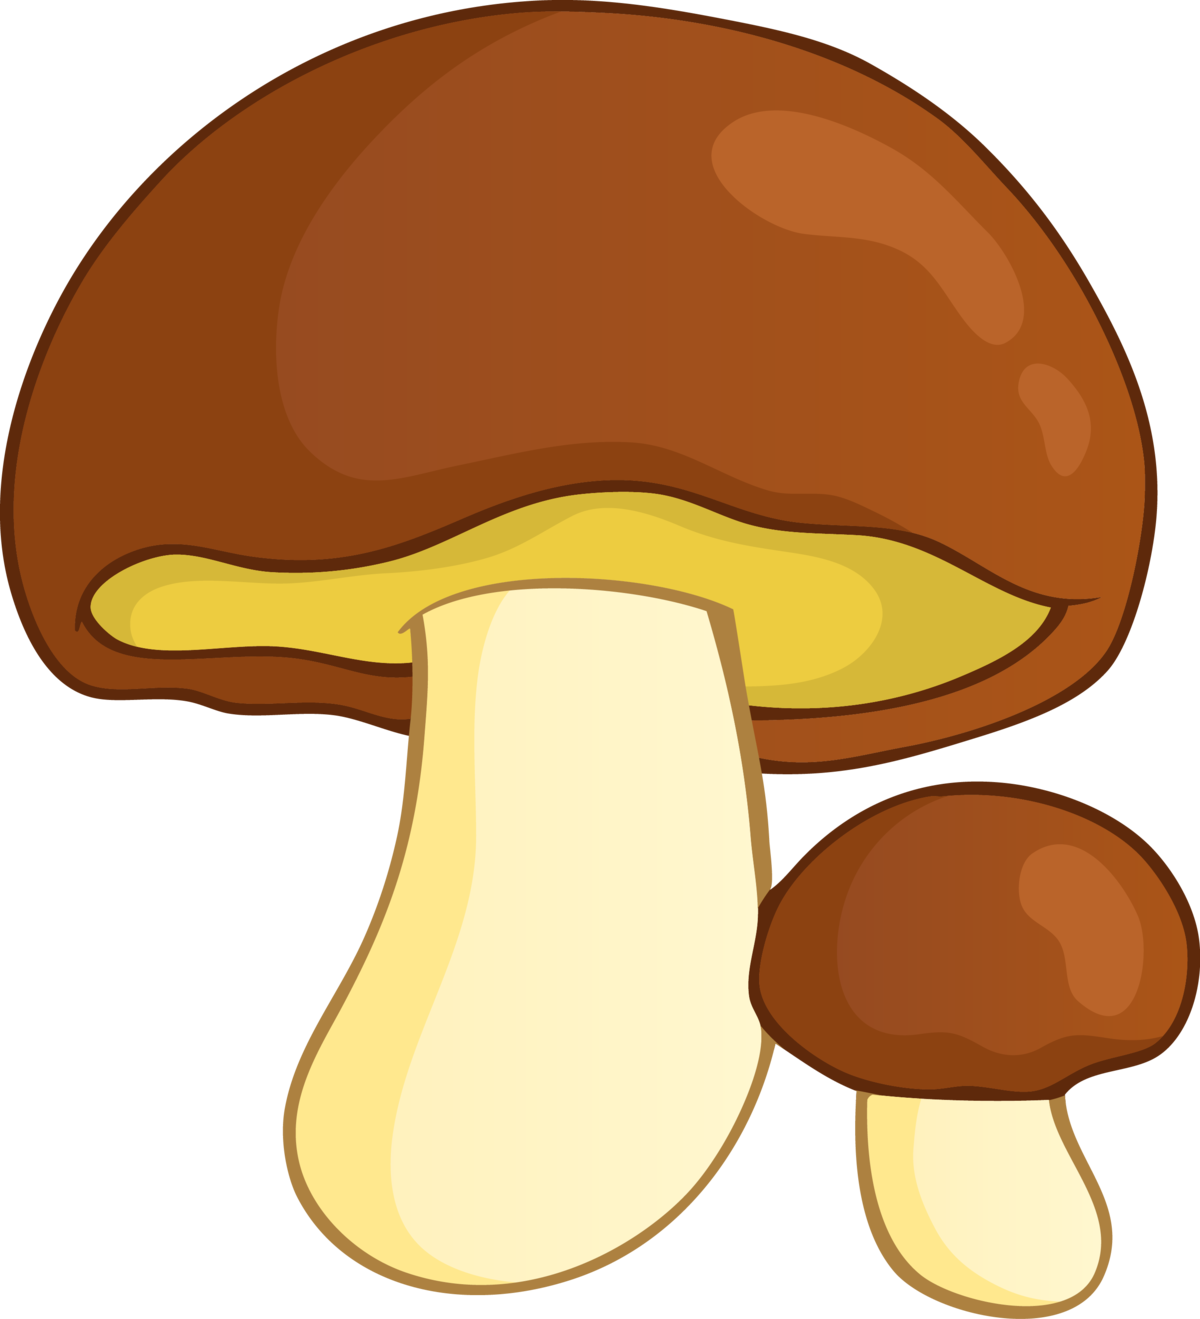 Картинка гриба нарисованная